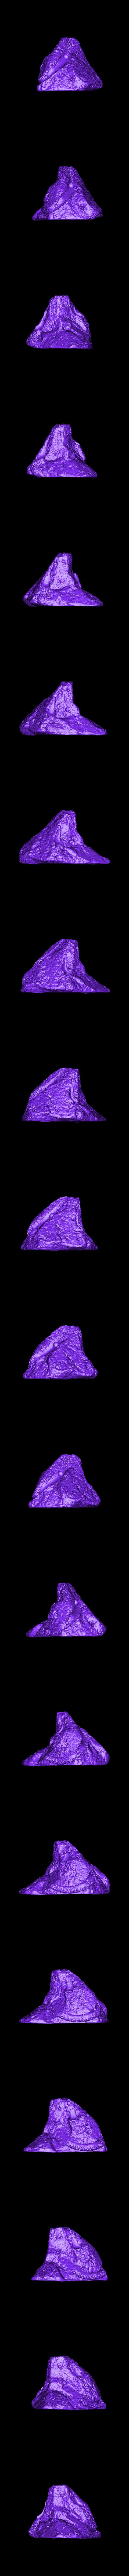 Rock.stl Download free STL file King of the Lizzard • Object to 3D print, Boris3dStudio